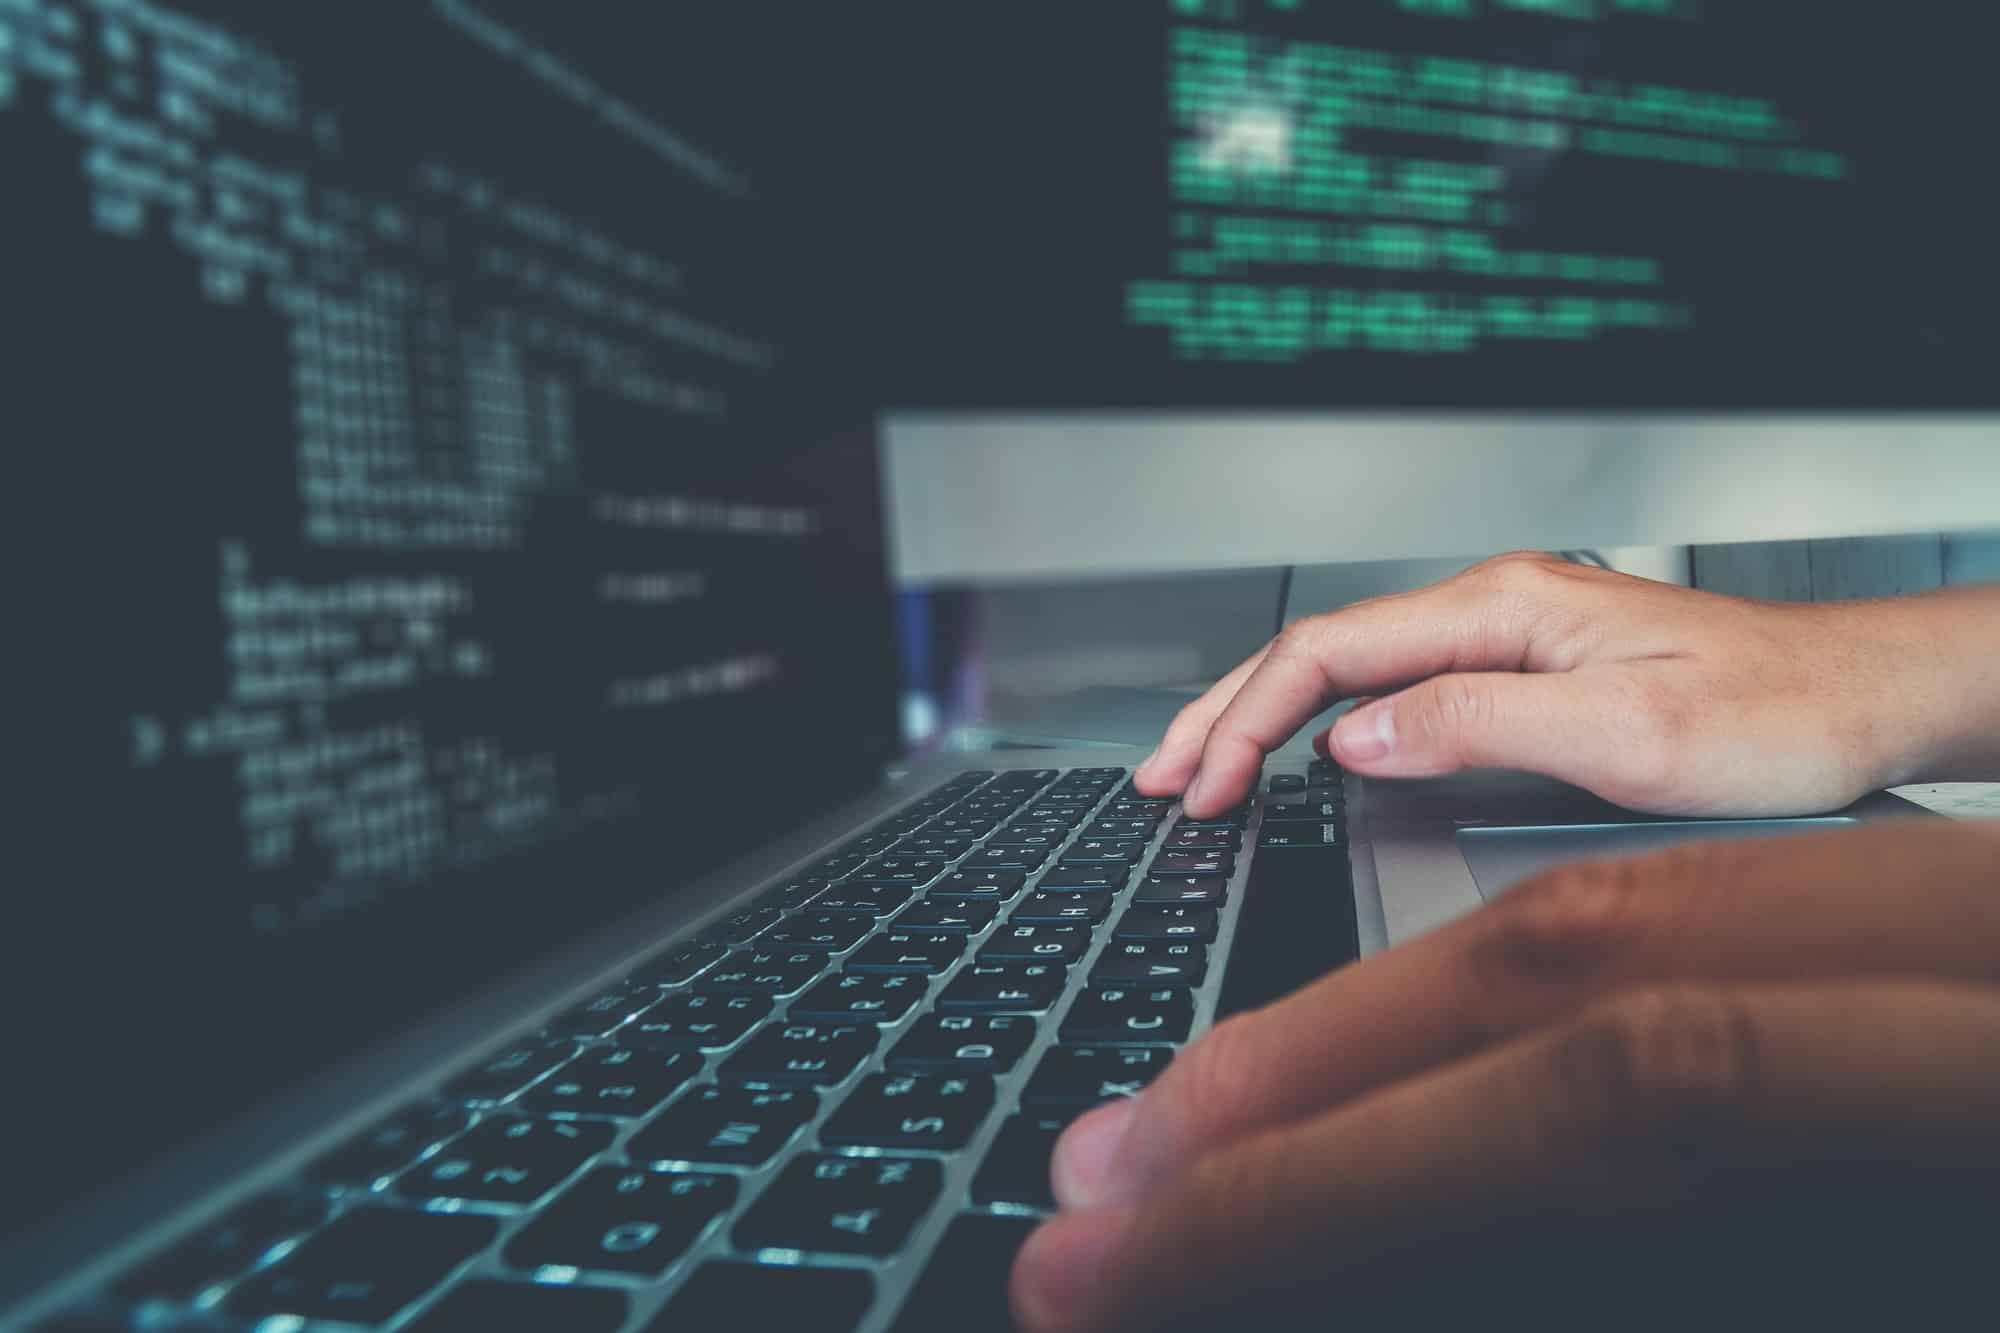 Developing programmer Development Website design and coding technologies working